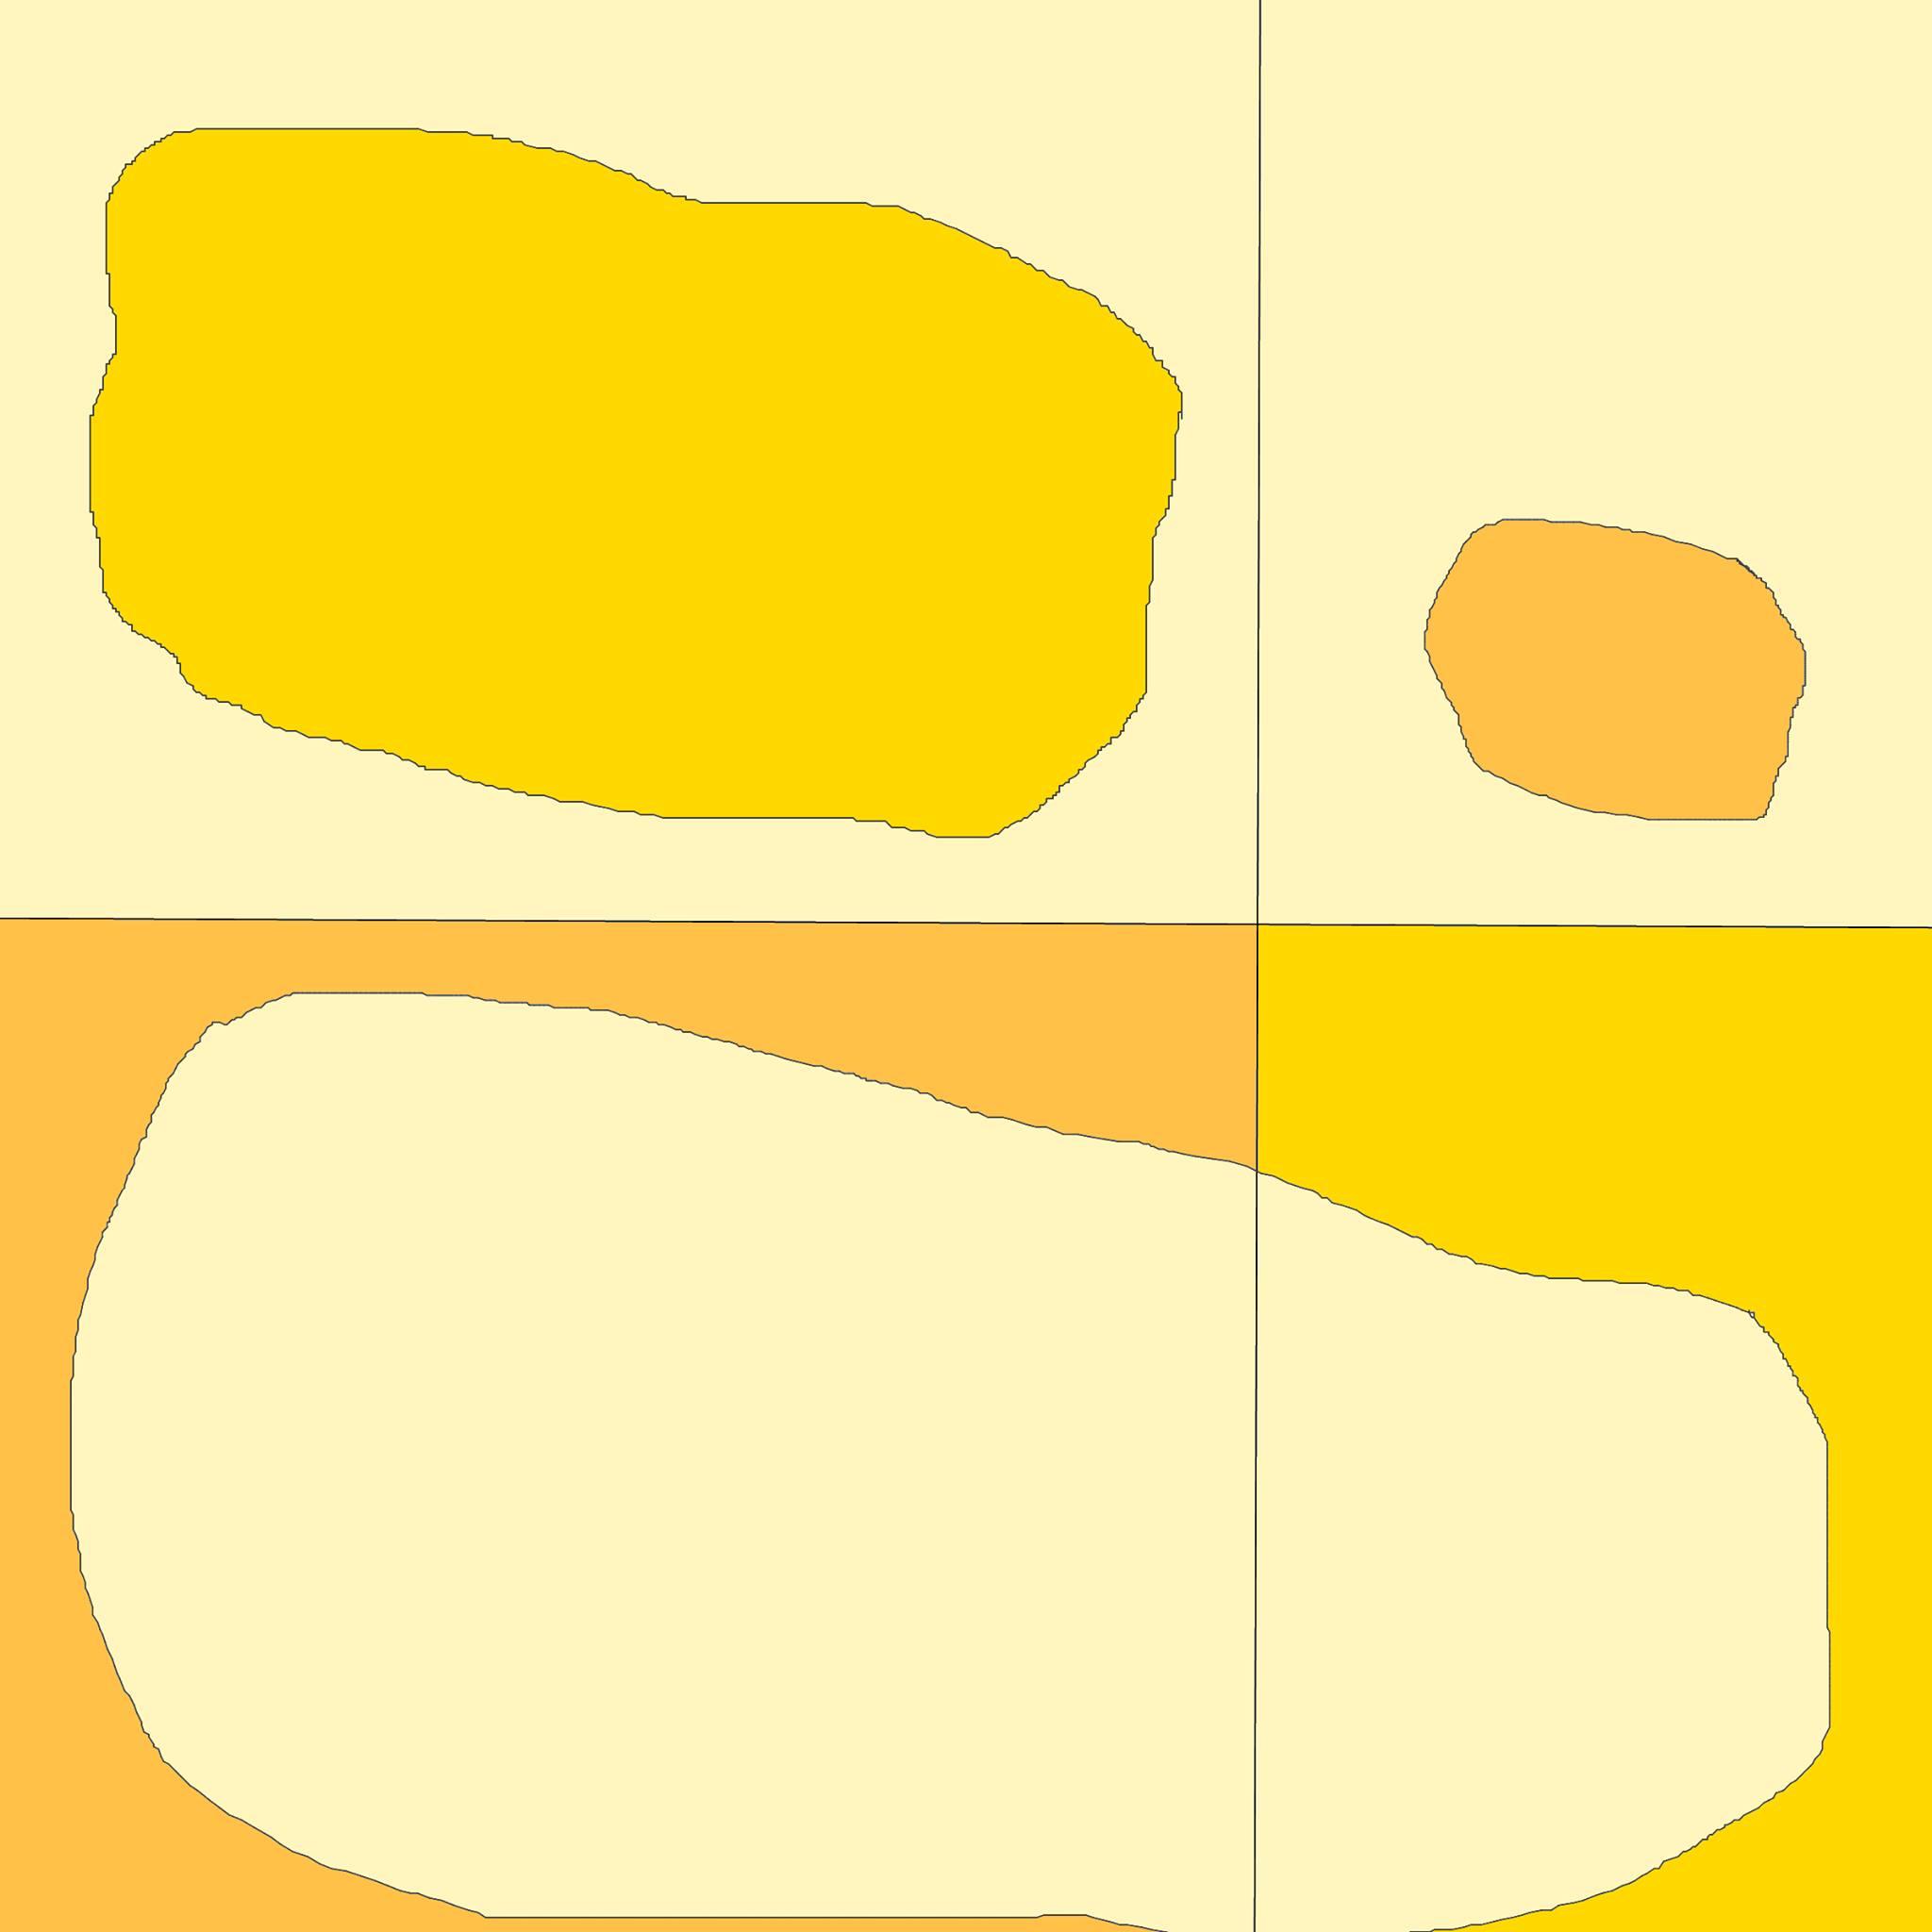 Boulders Yellow